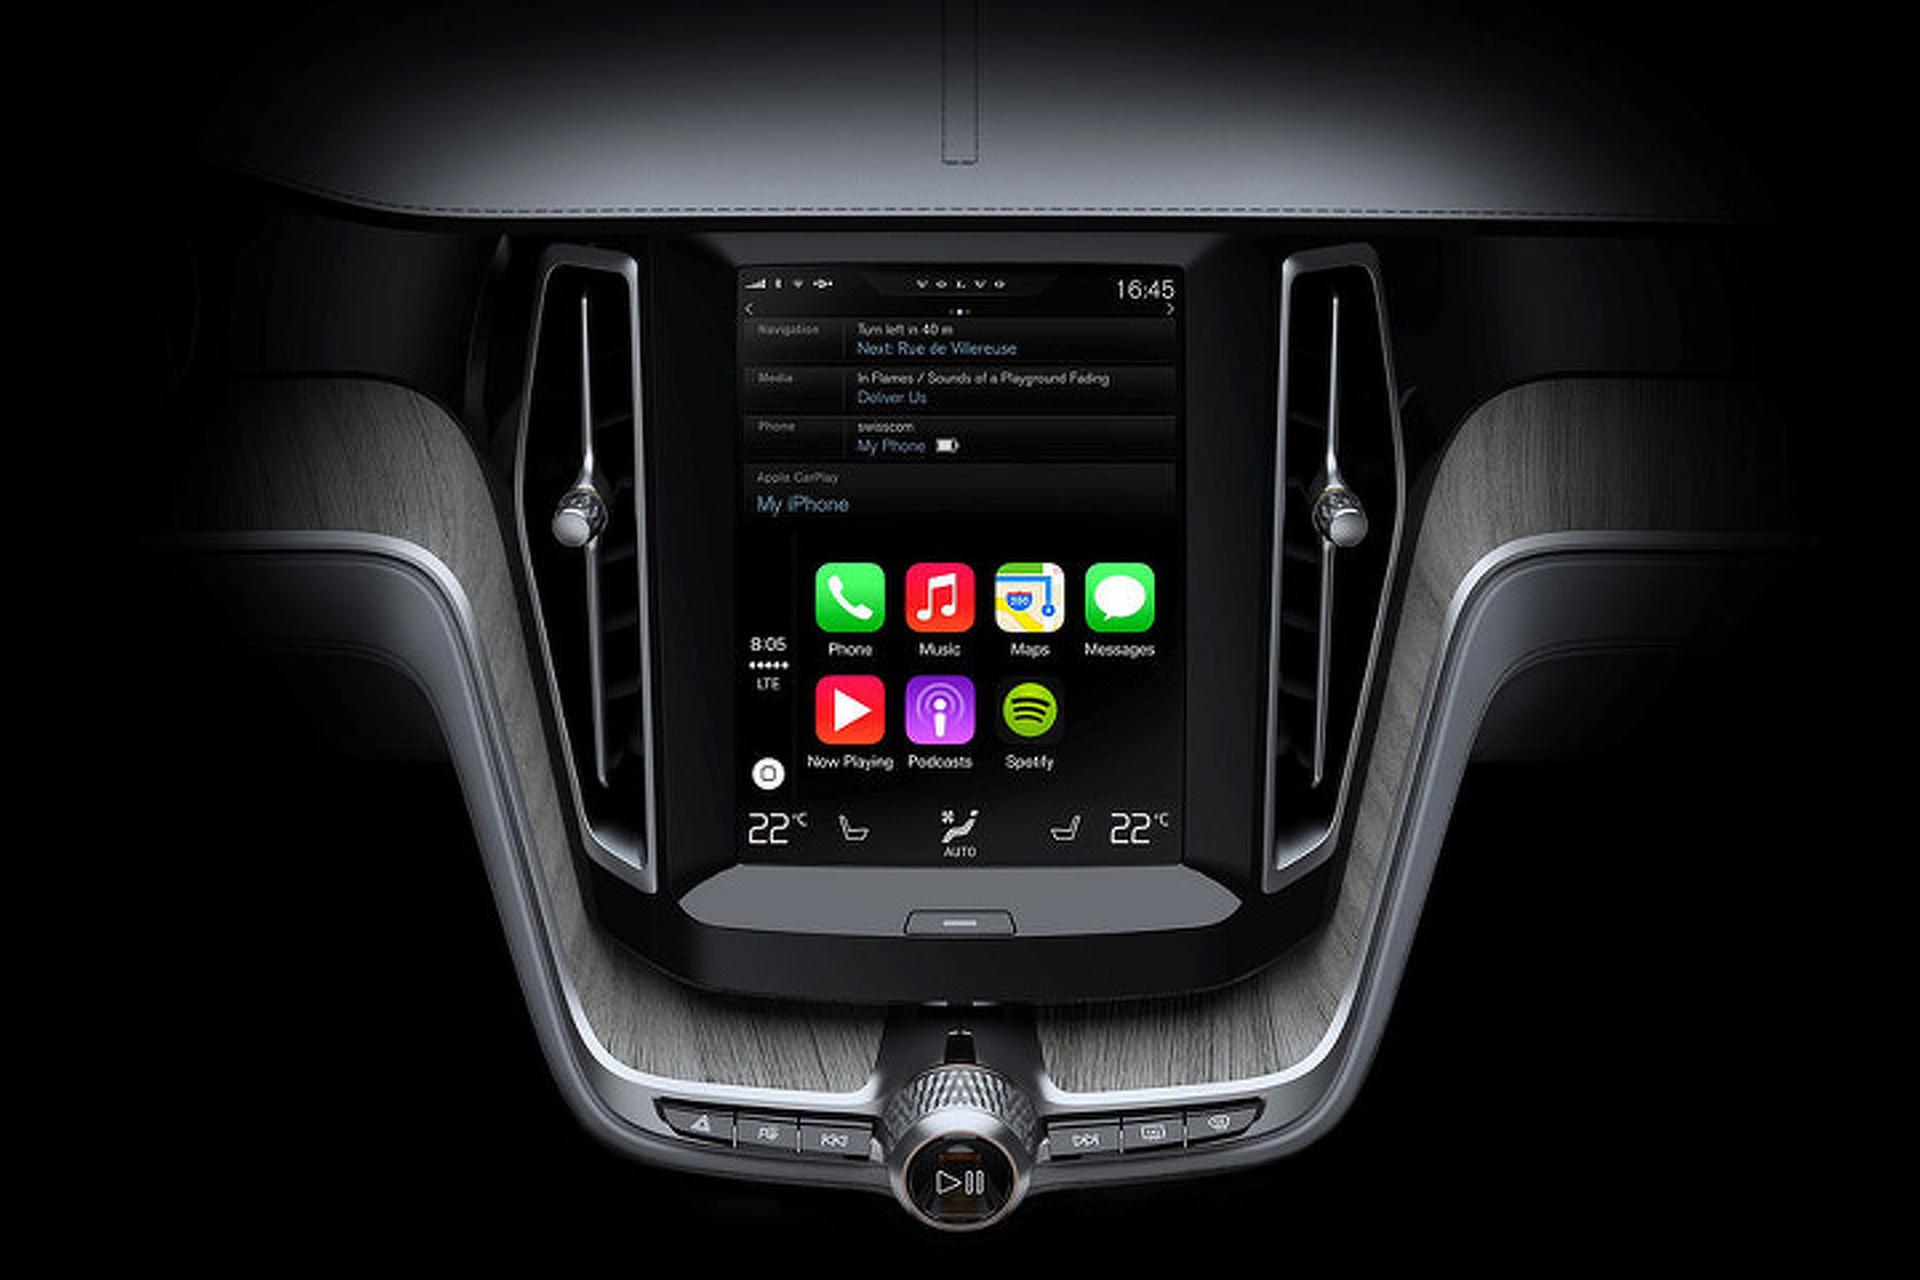 Apple CarPlay: Big Help or Big Distraction?